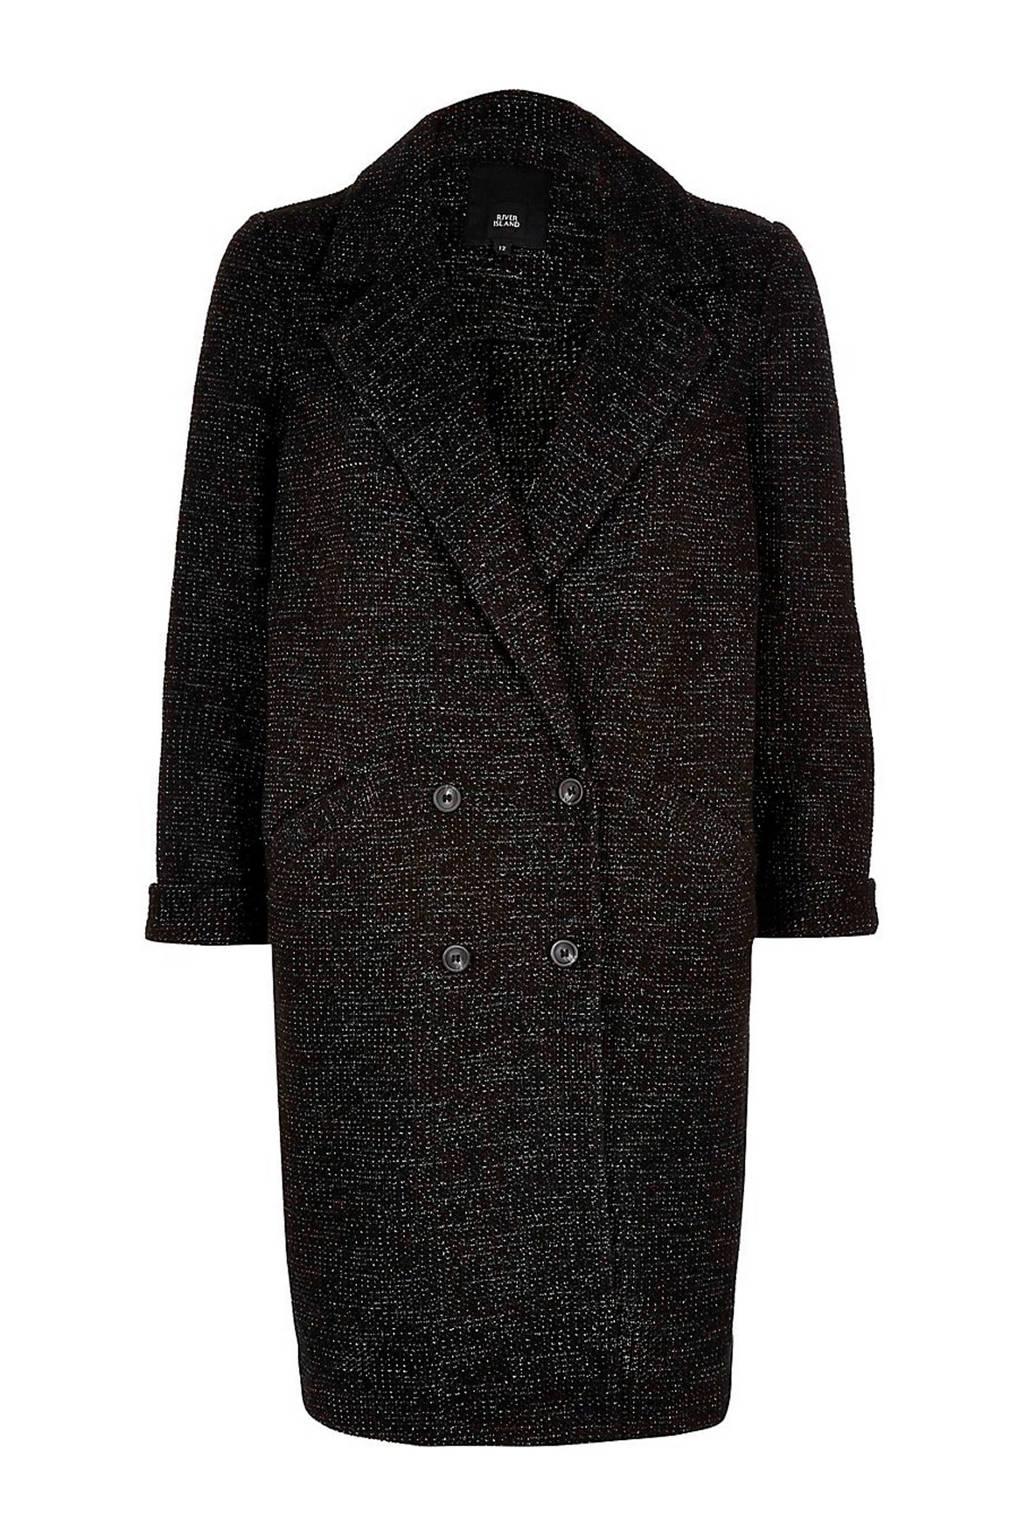 River Island coat zwart, zwart/ wit